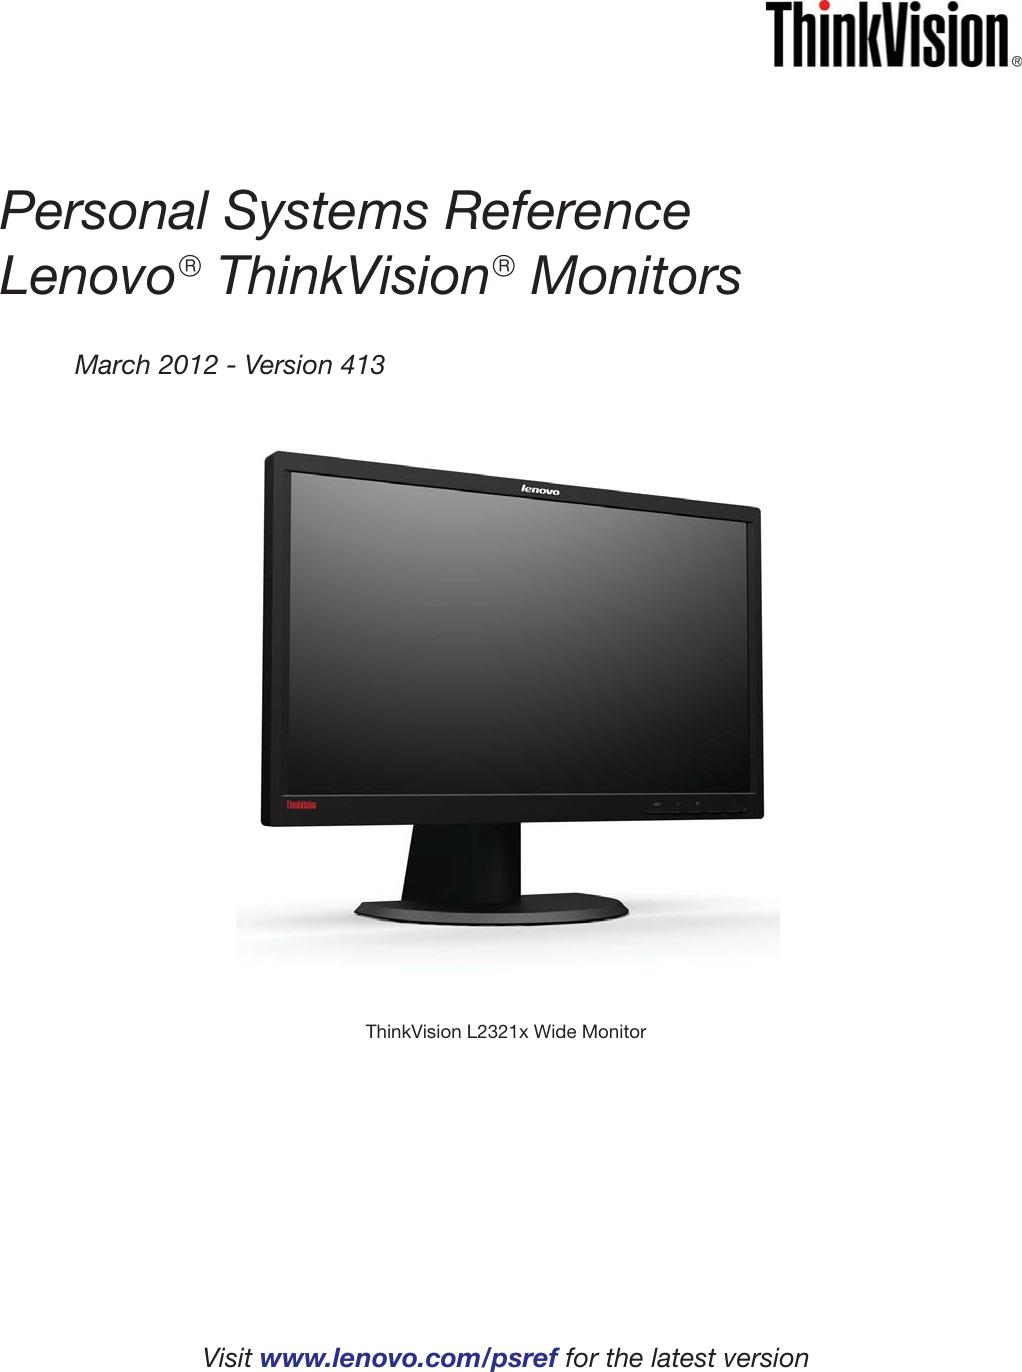 lenovo thinkvision l2321x users manual monitor rh usermanual wiki lenovo thinkvision l2250p wide manual ThinkVision Lenovo 4431-Hb2